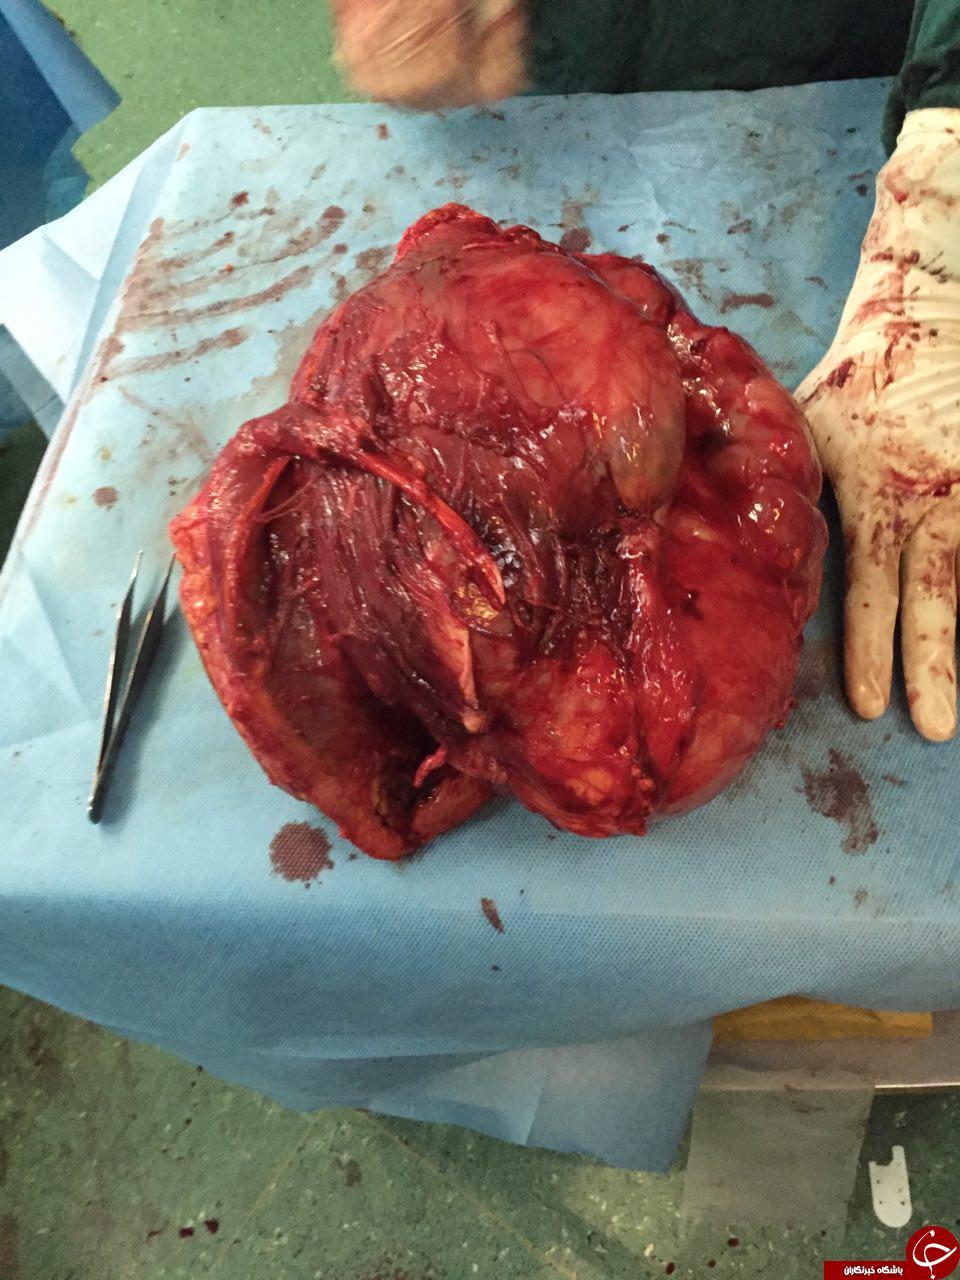 تومور, تومور خطرناک, عمل جراحی تومور, تومور در دست, عکس تومور خطرناک, عکس تومور خوش خیم, عکس تومور بد خیم, تومور پا, تومور مغز